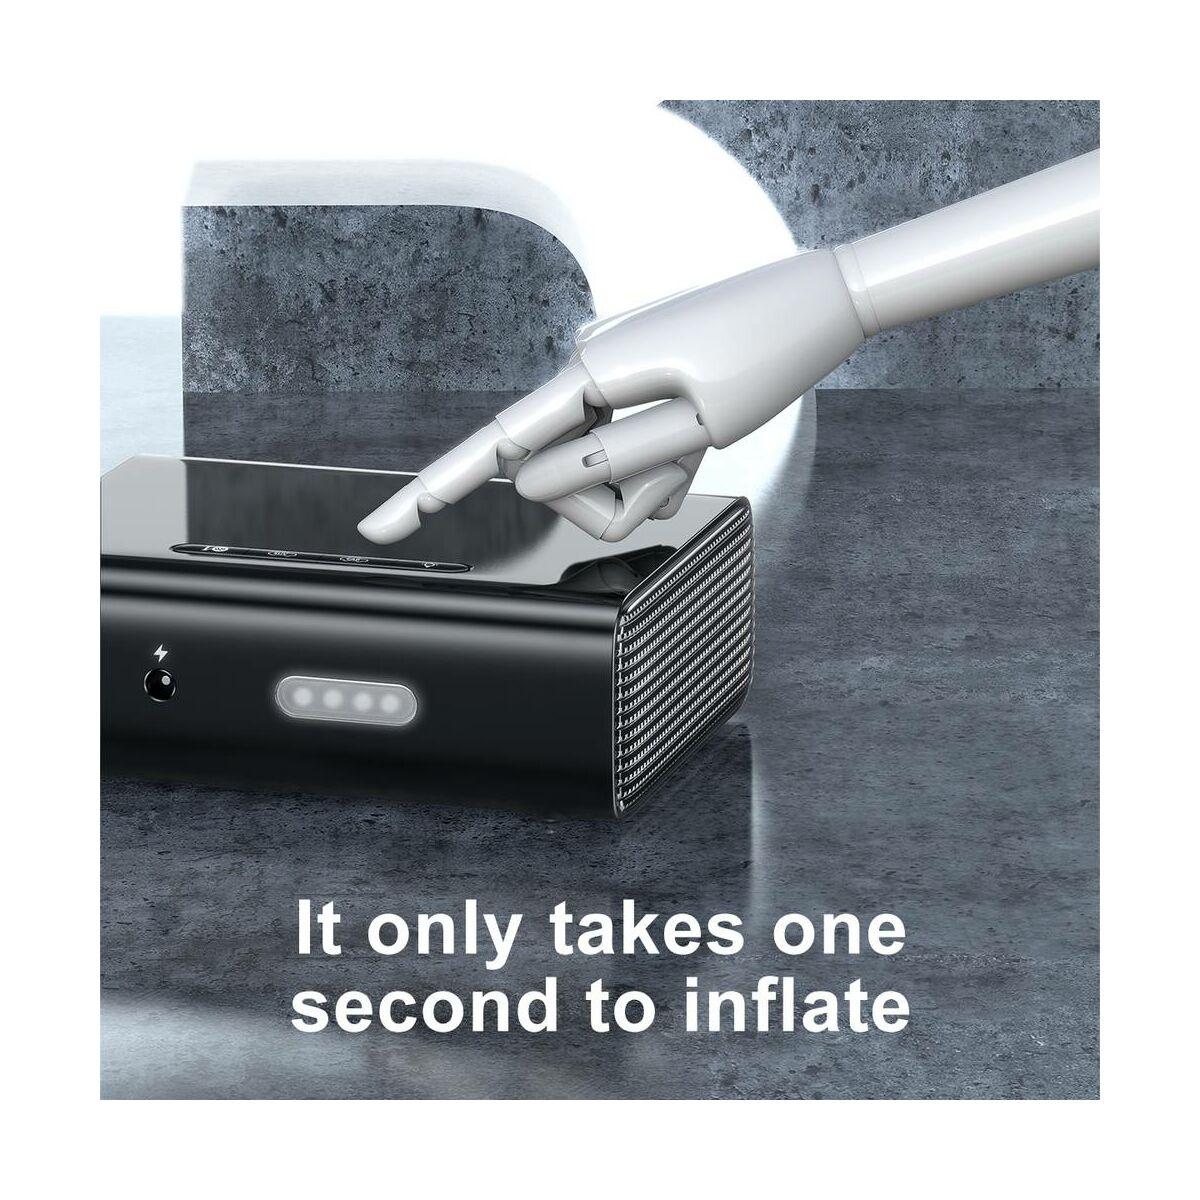 Baseus autós kiegészítő, Smart mini kompressor, 120W, fehér (CRCQB01-02)